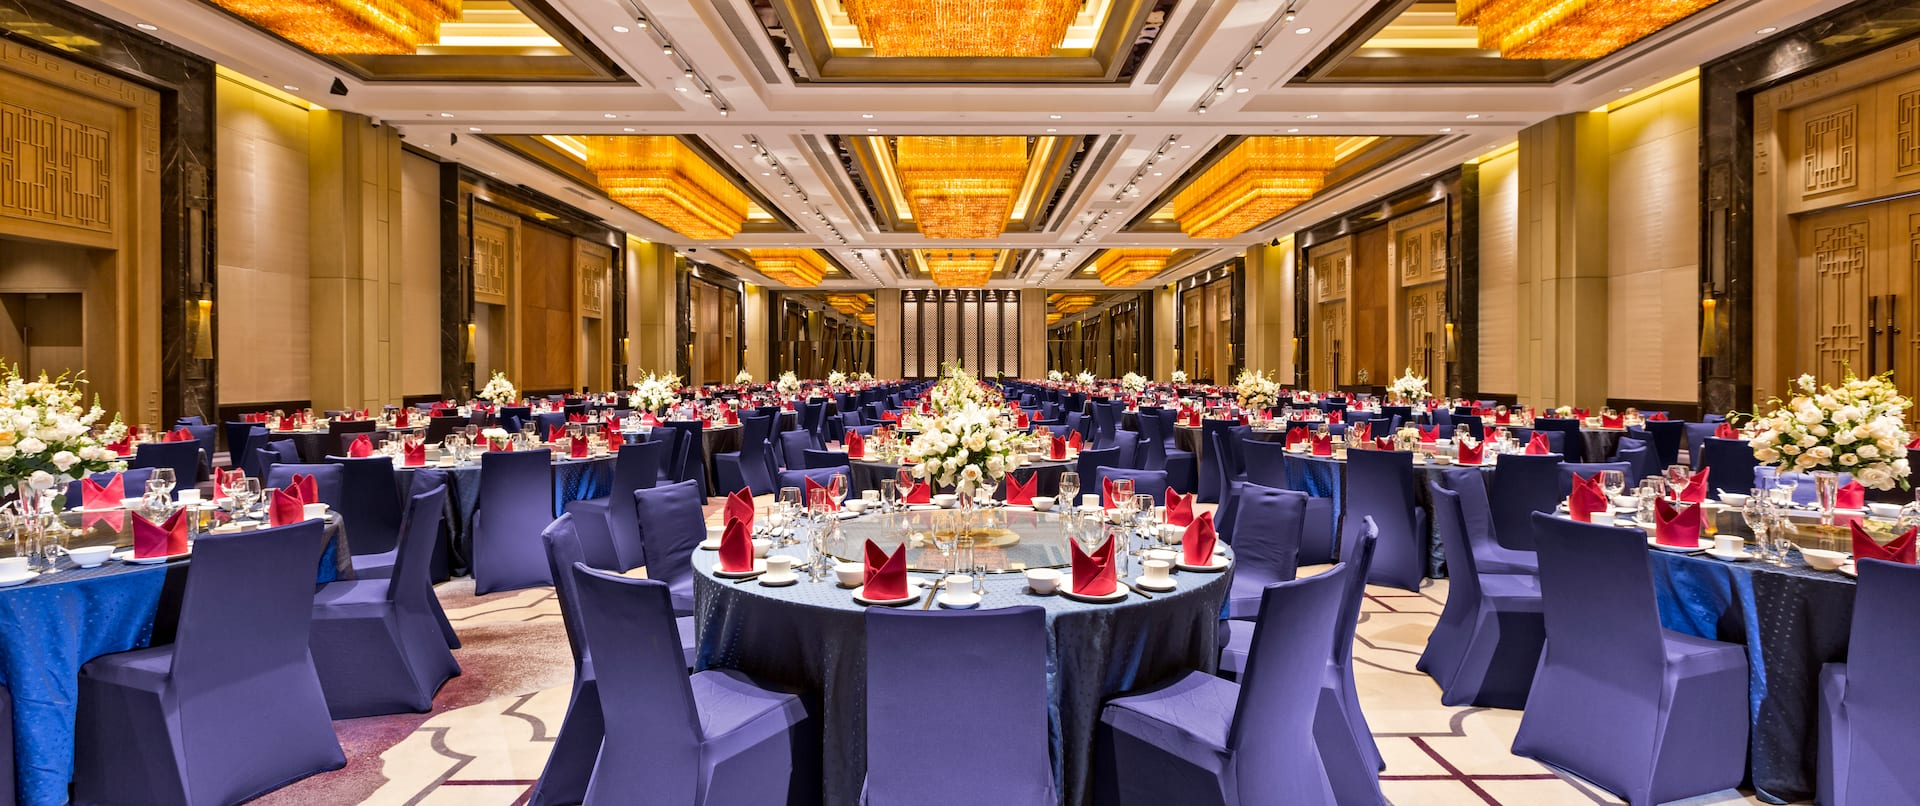 Cangshan Ballroom